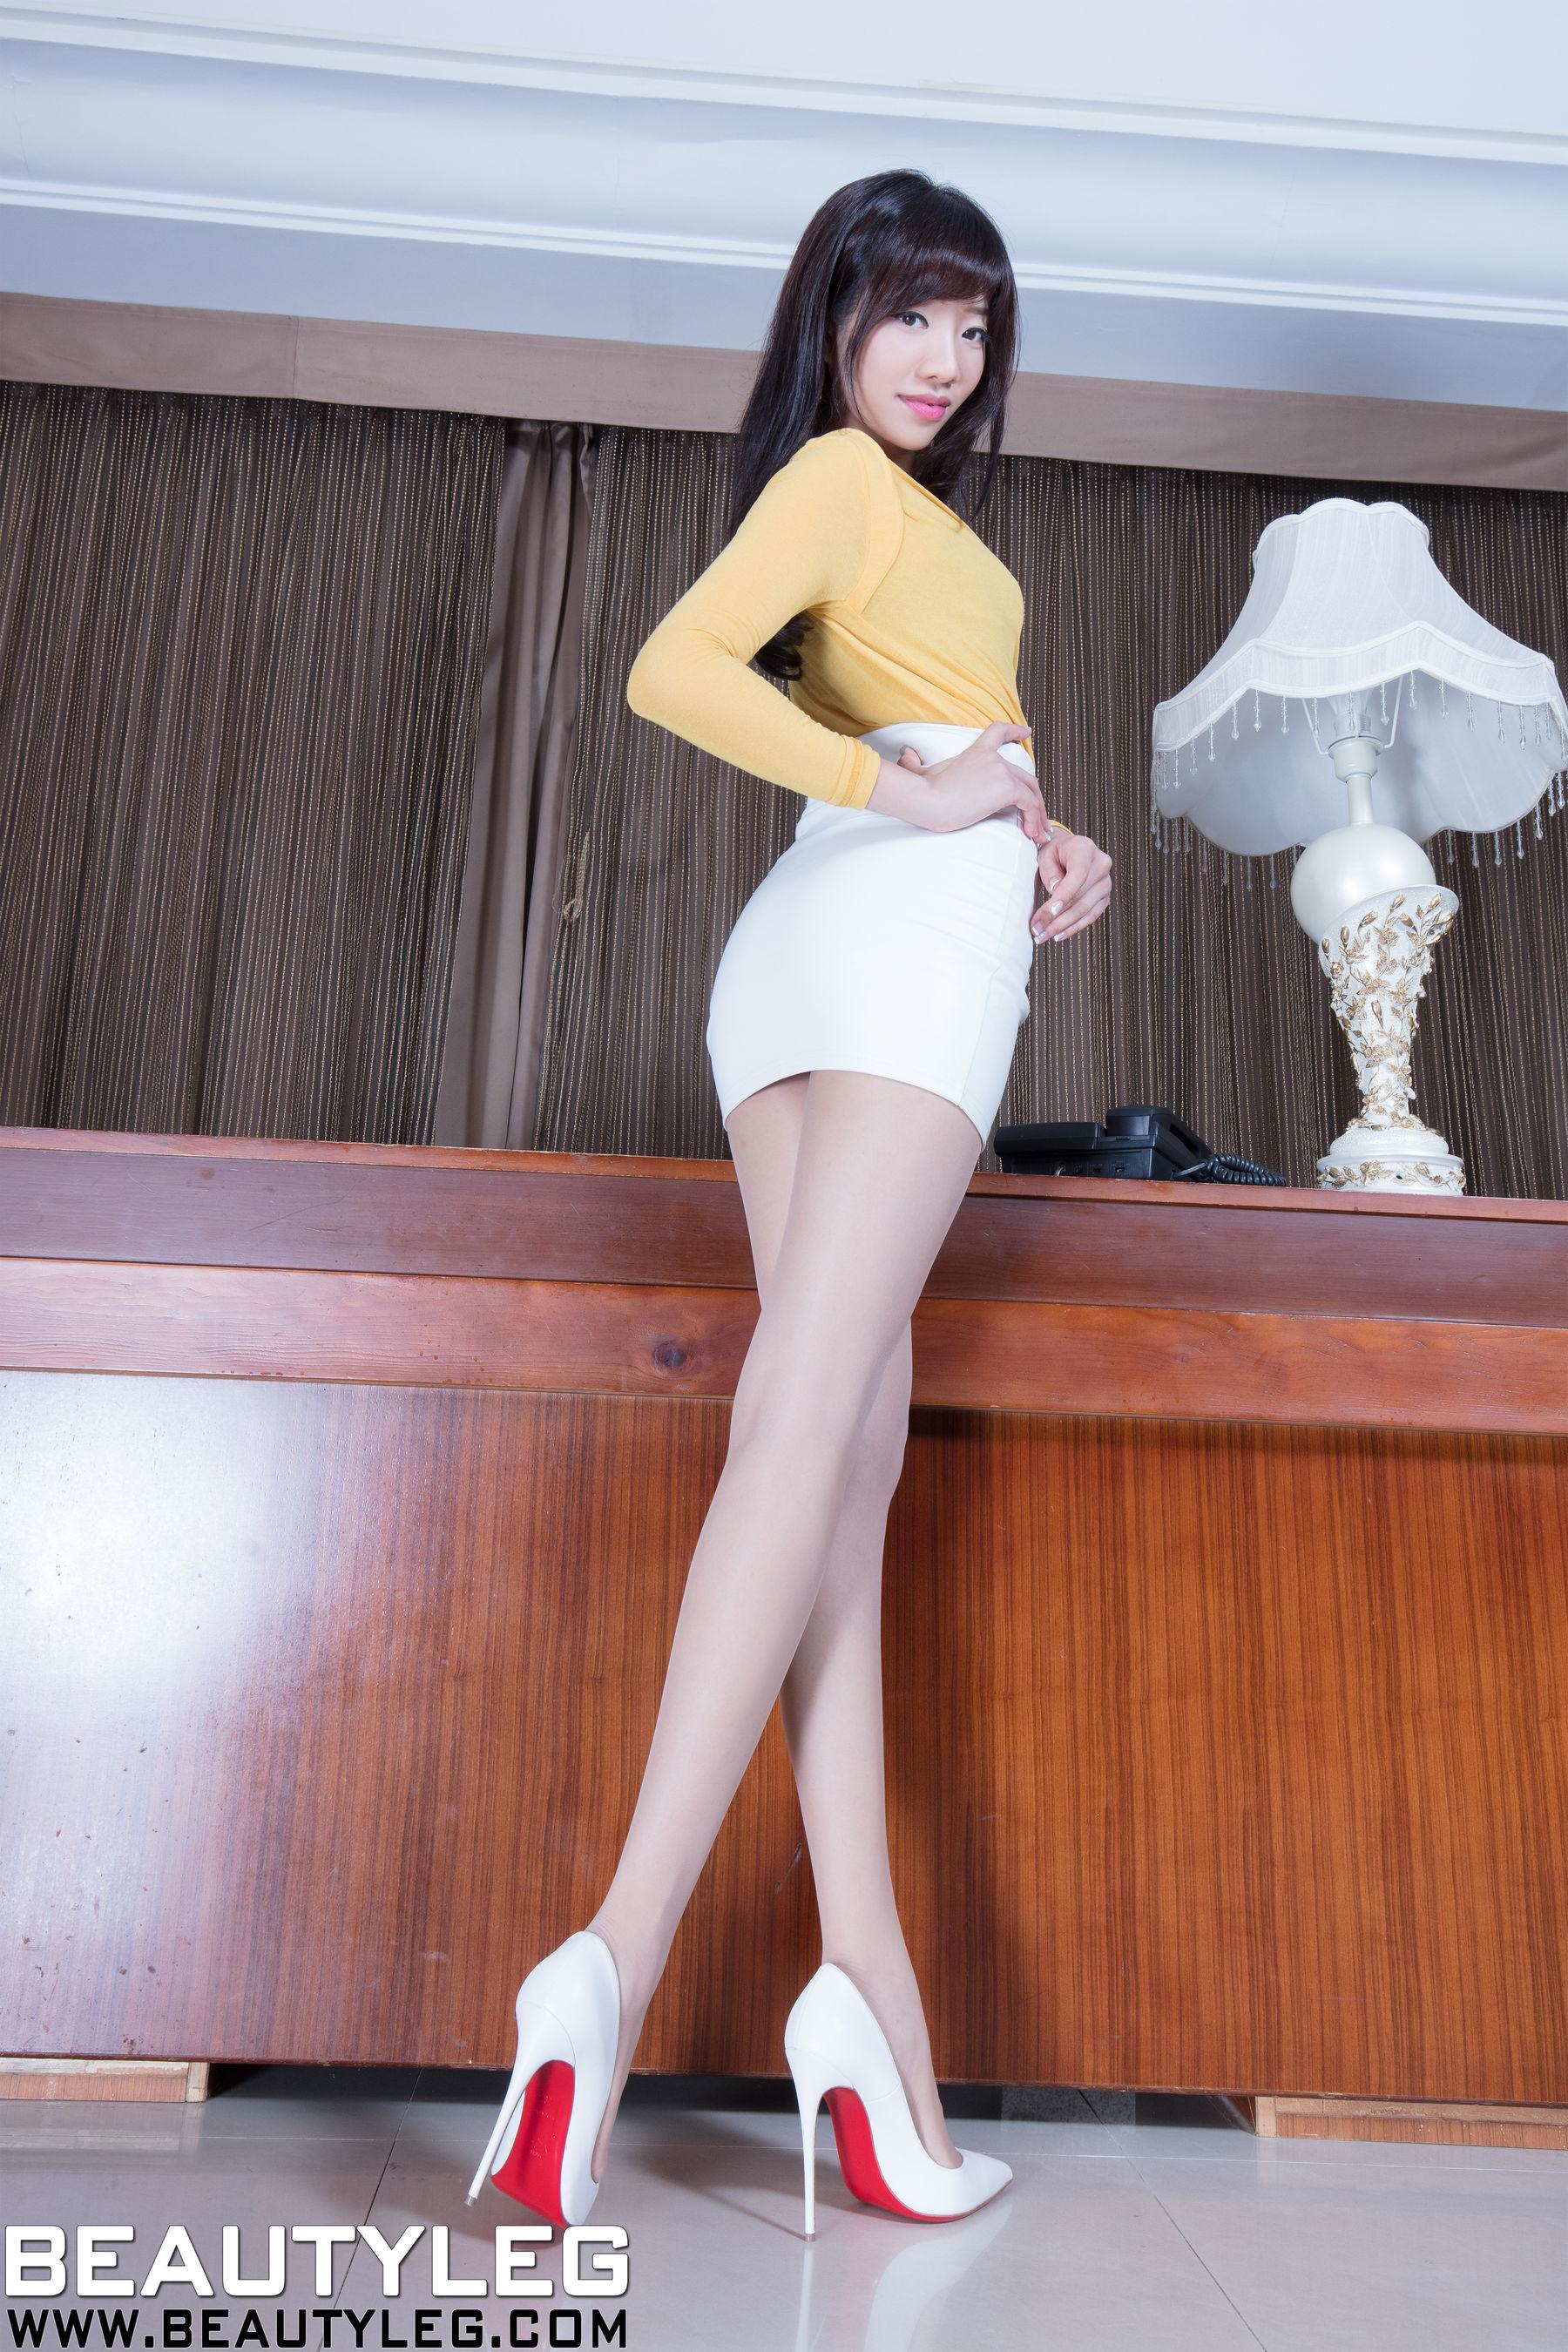 VOL.697 [Beautyleg]丝袜美腿包臀裙美女长腿美女:欣洁(腿模Celia)超高清个人性感漂亮大图(52P)